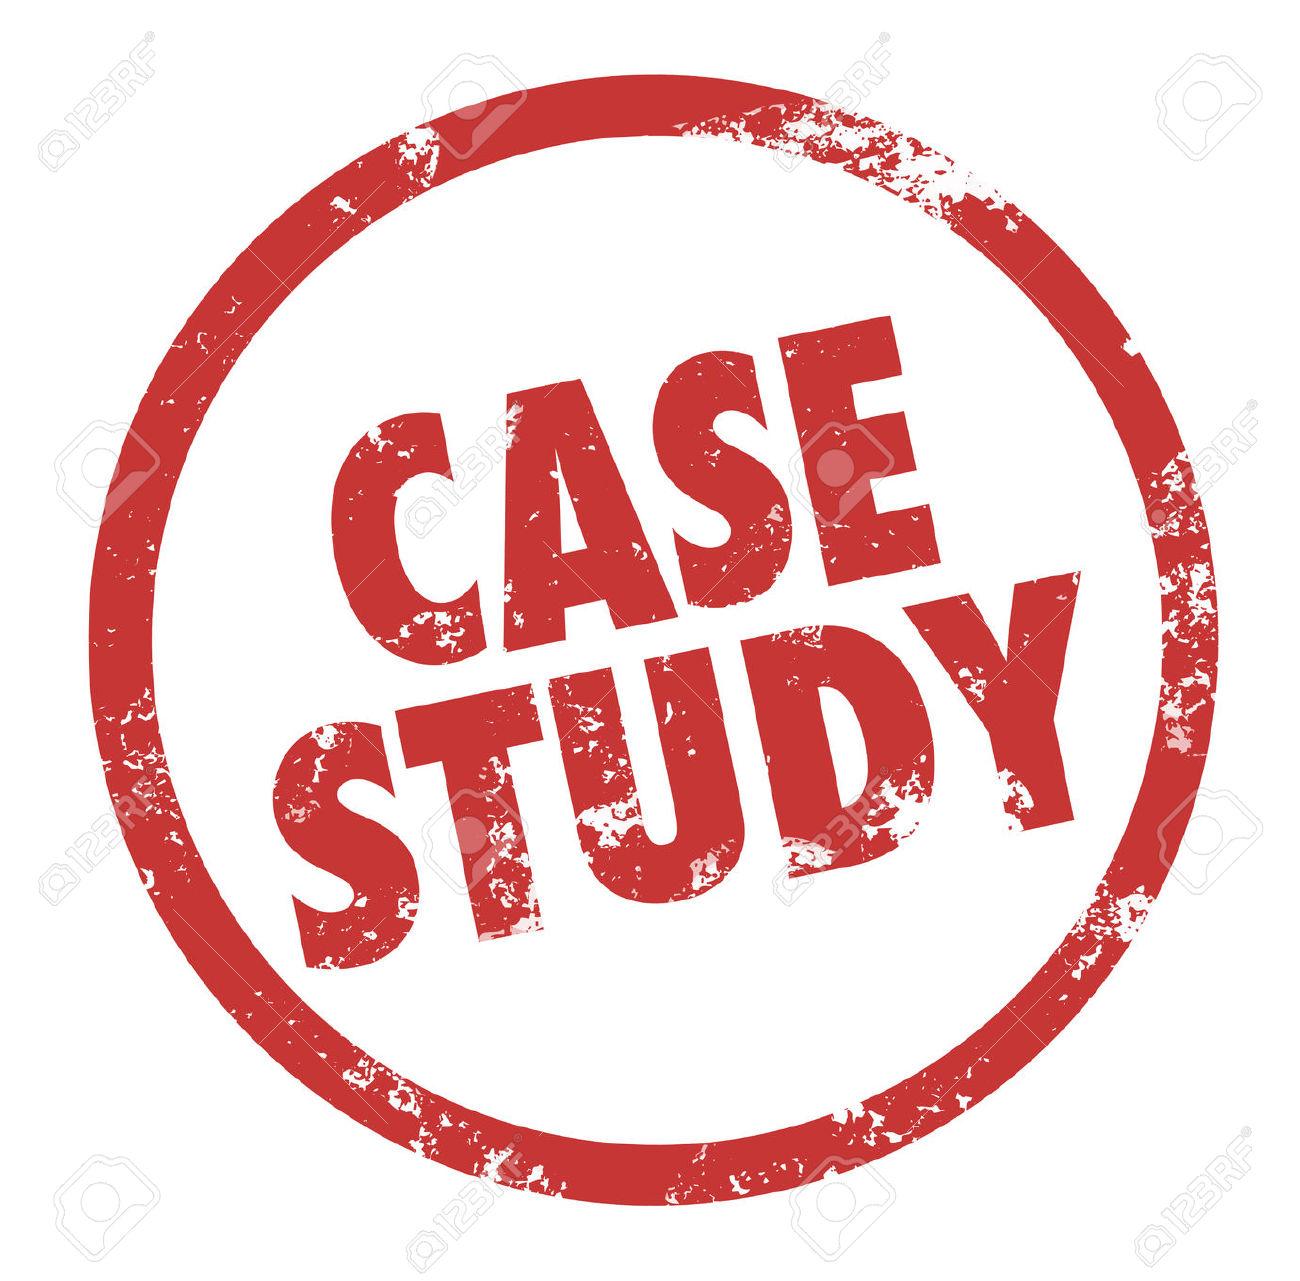 Case study clipart vector freeuse stock Case study clipart 9 » Clipart Station vector freeuse stock